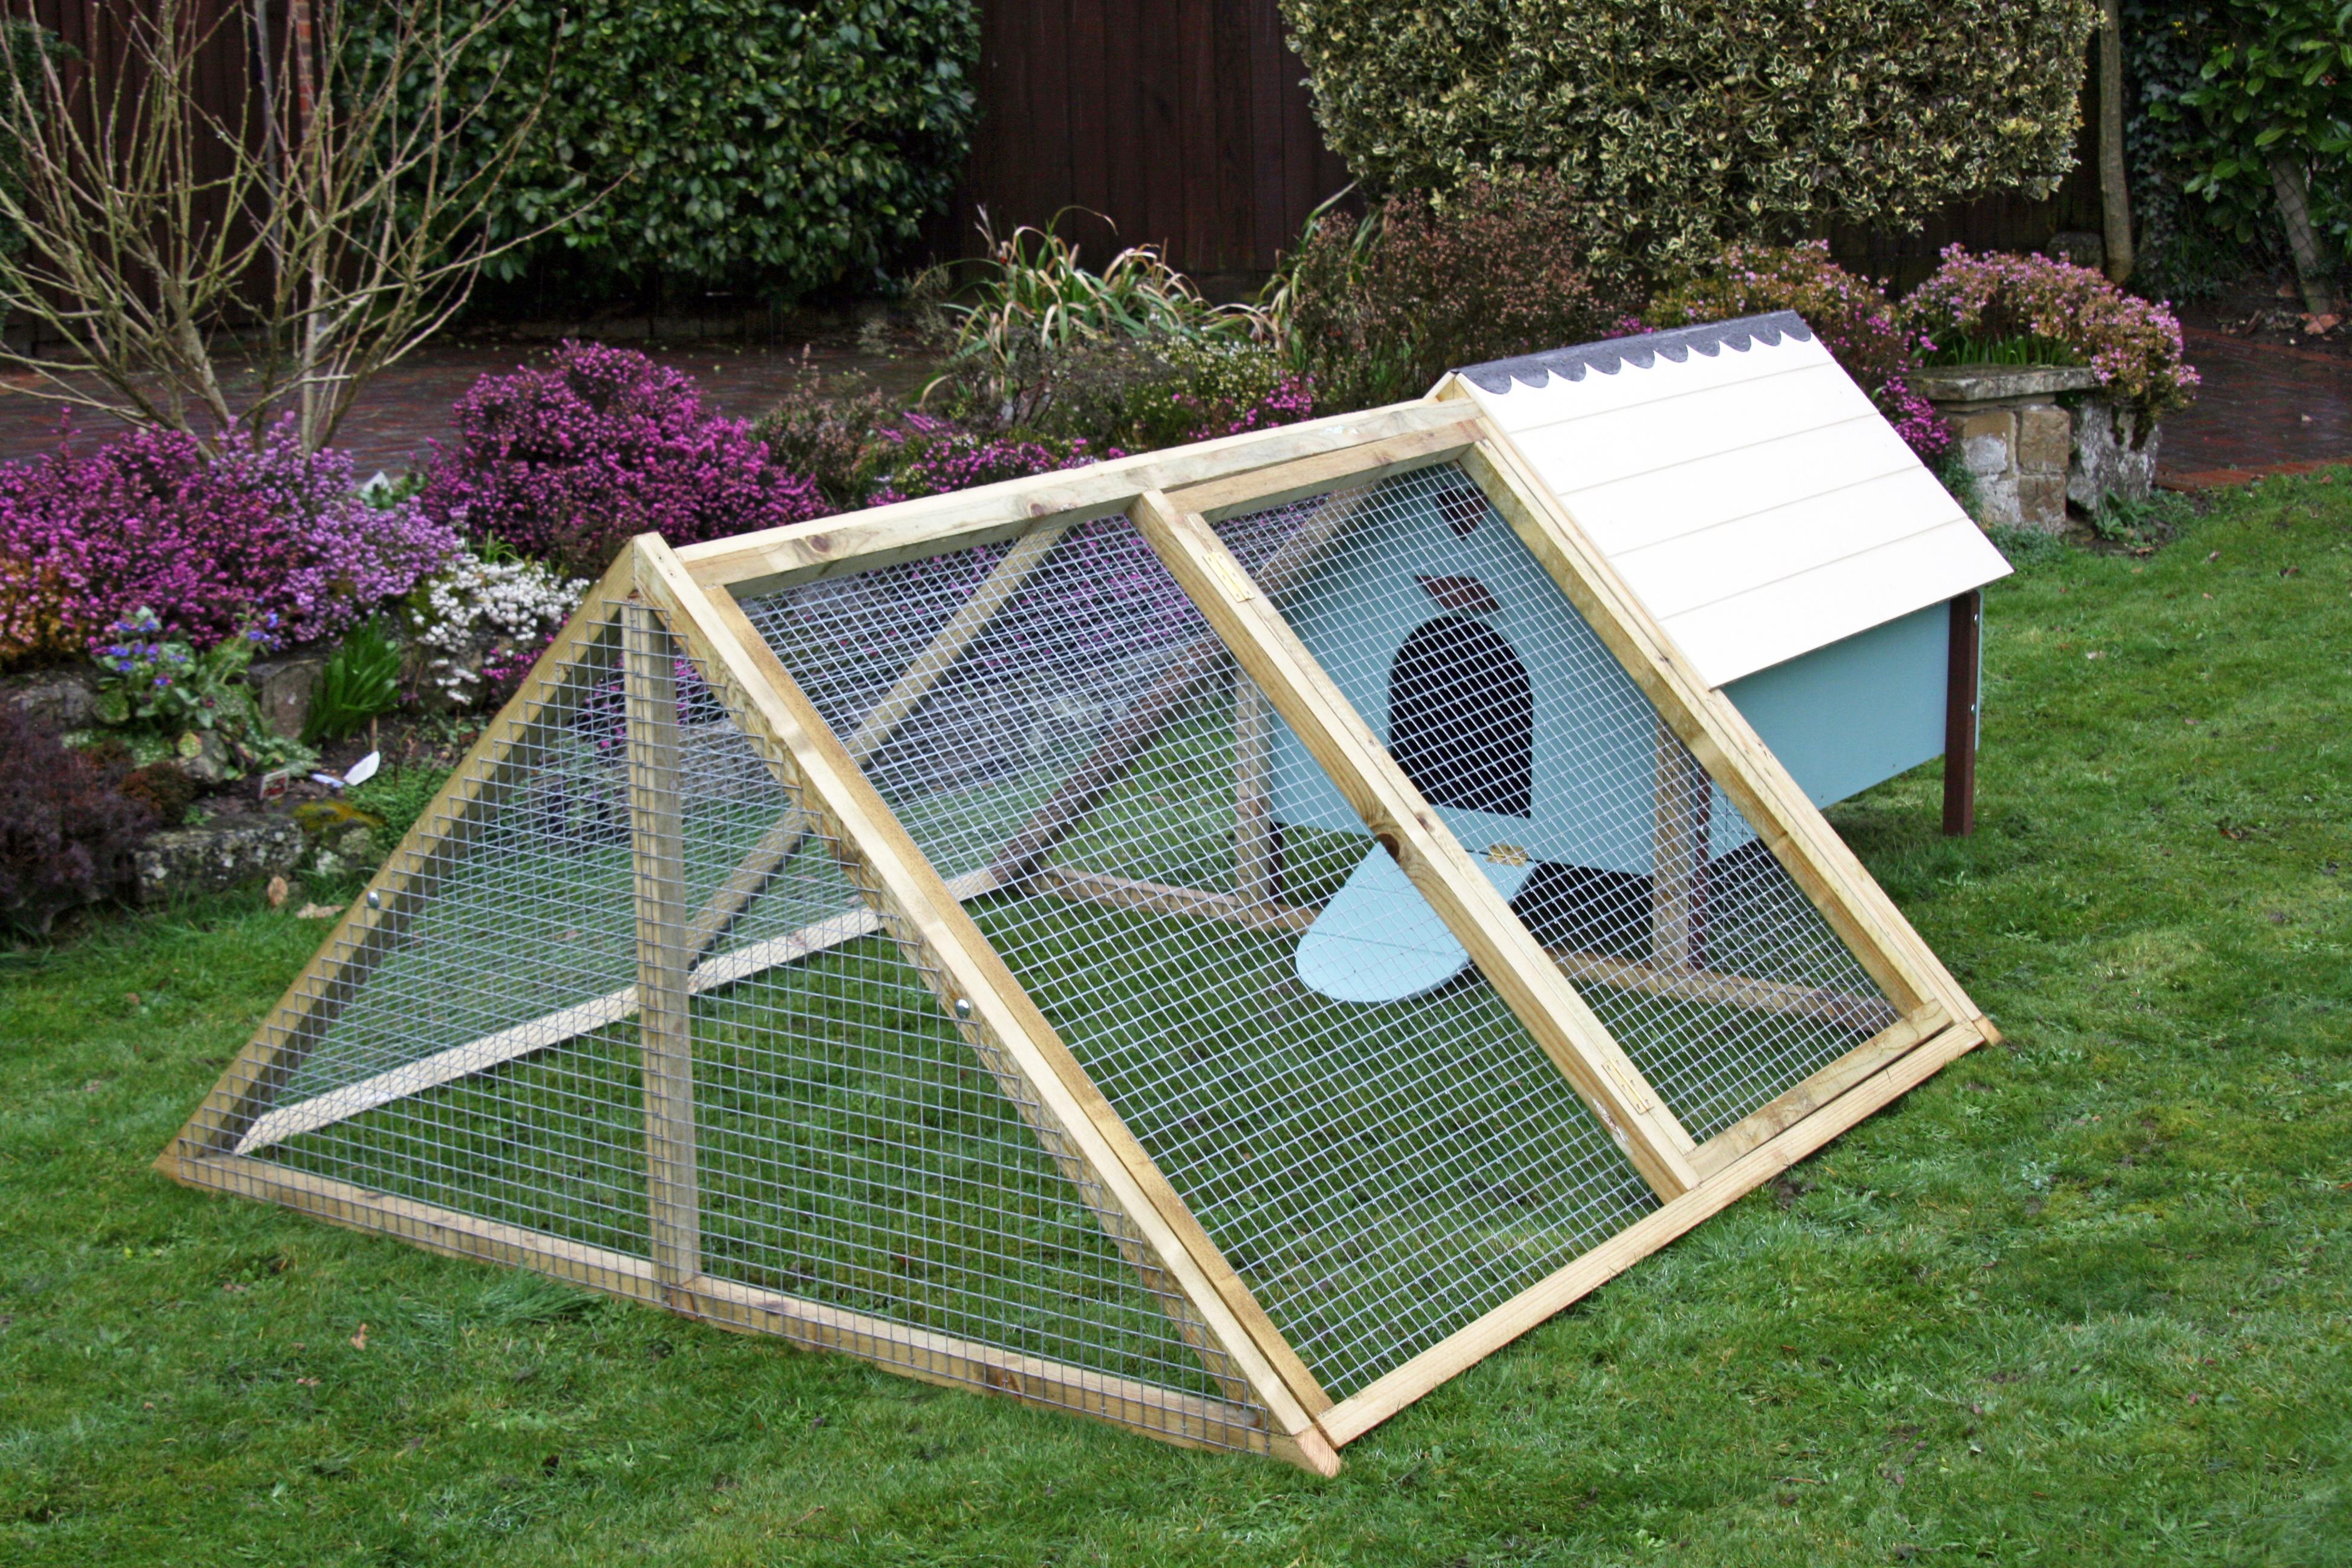 henhouse atffixed to an 'A-frame' enclosure